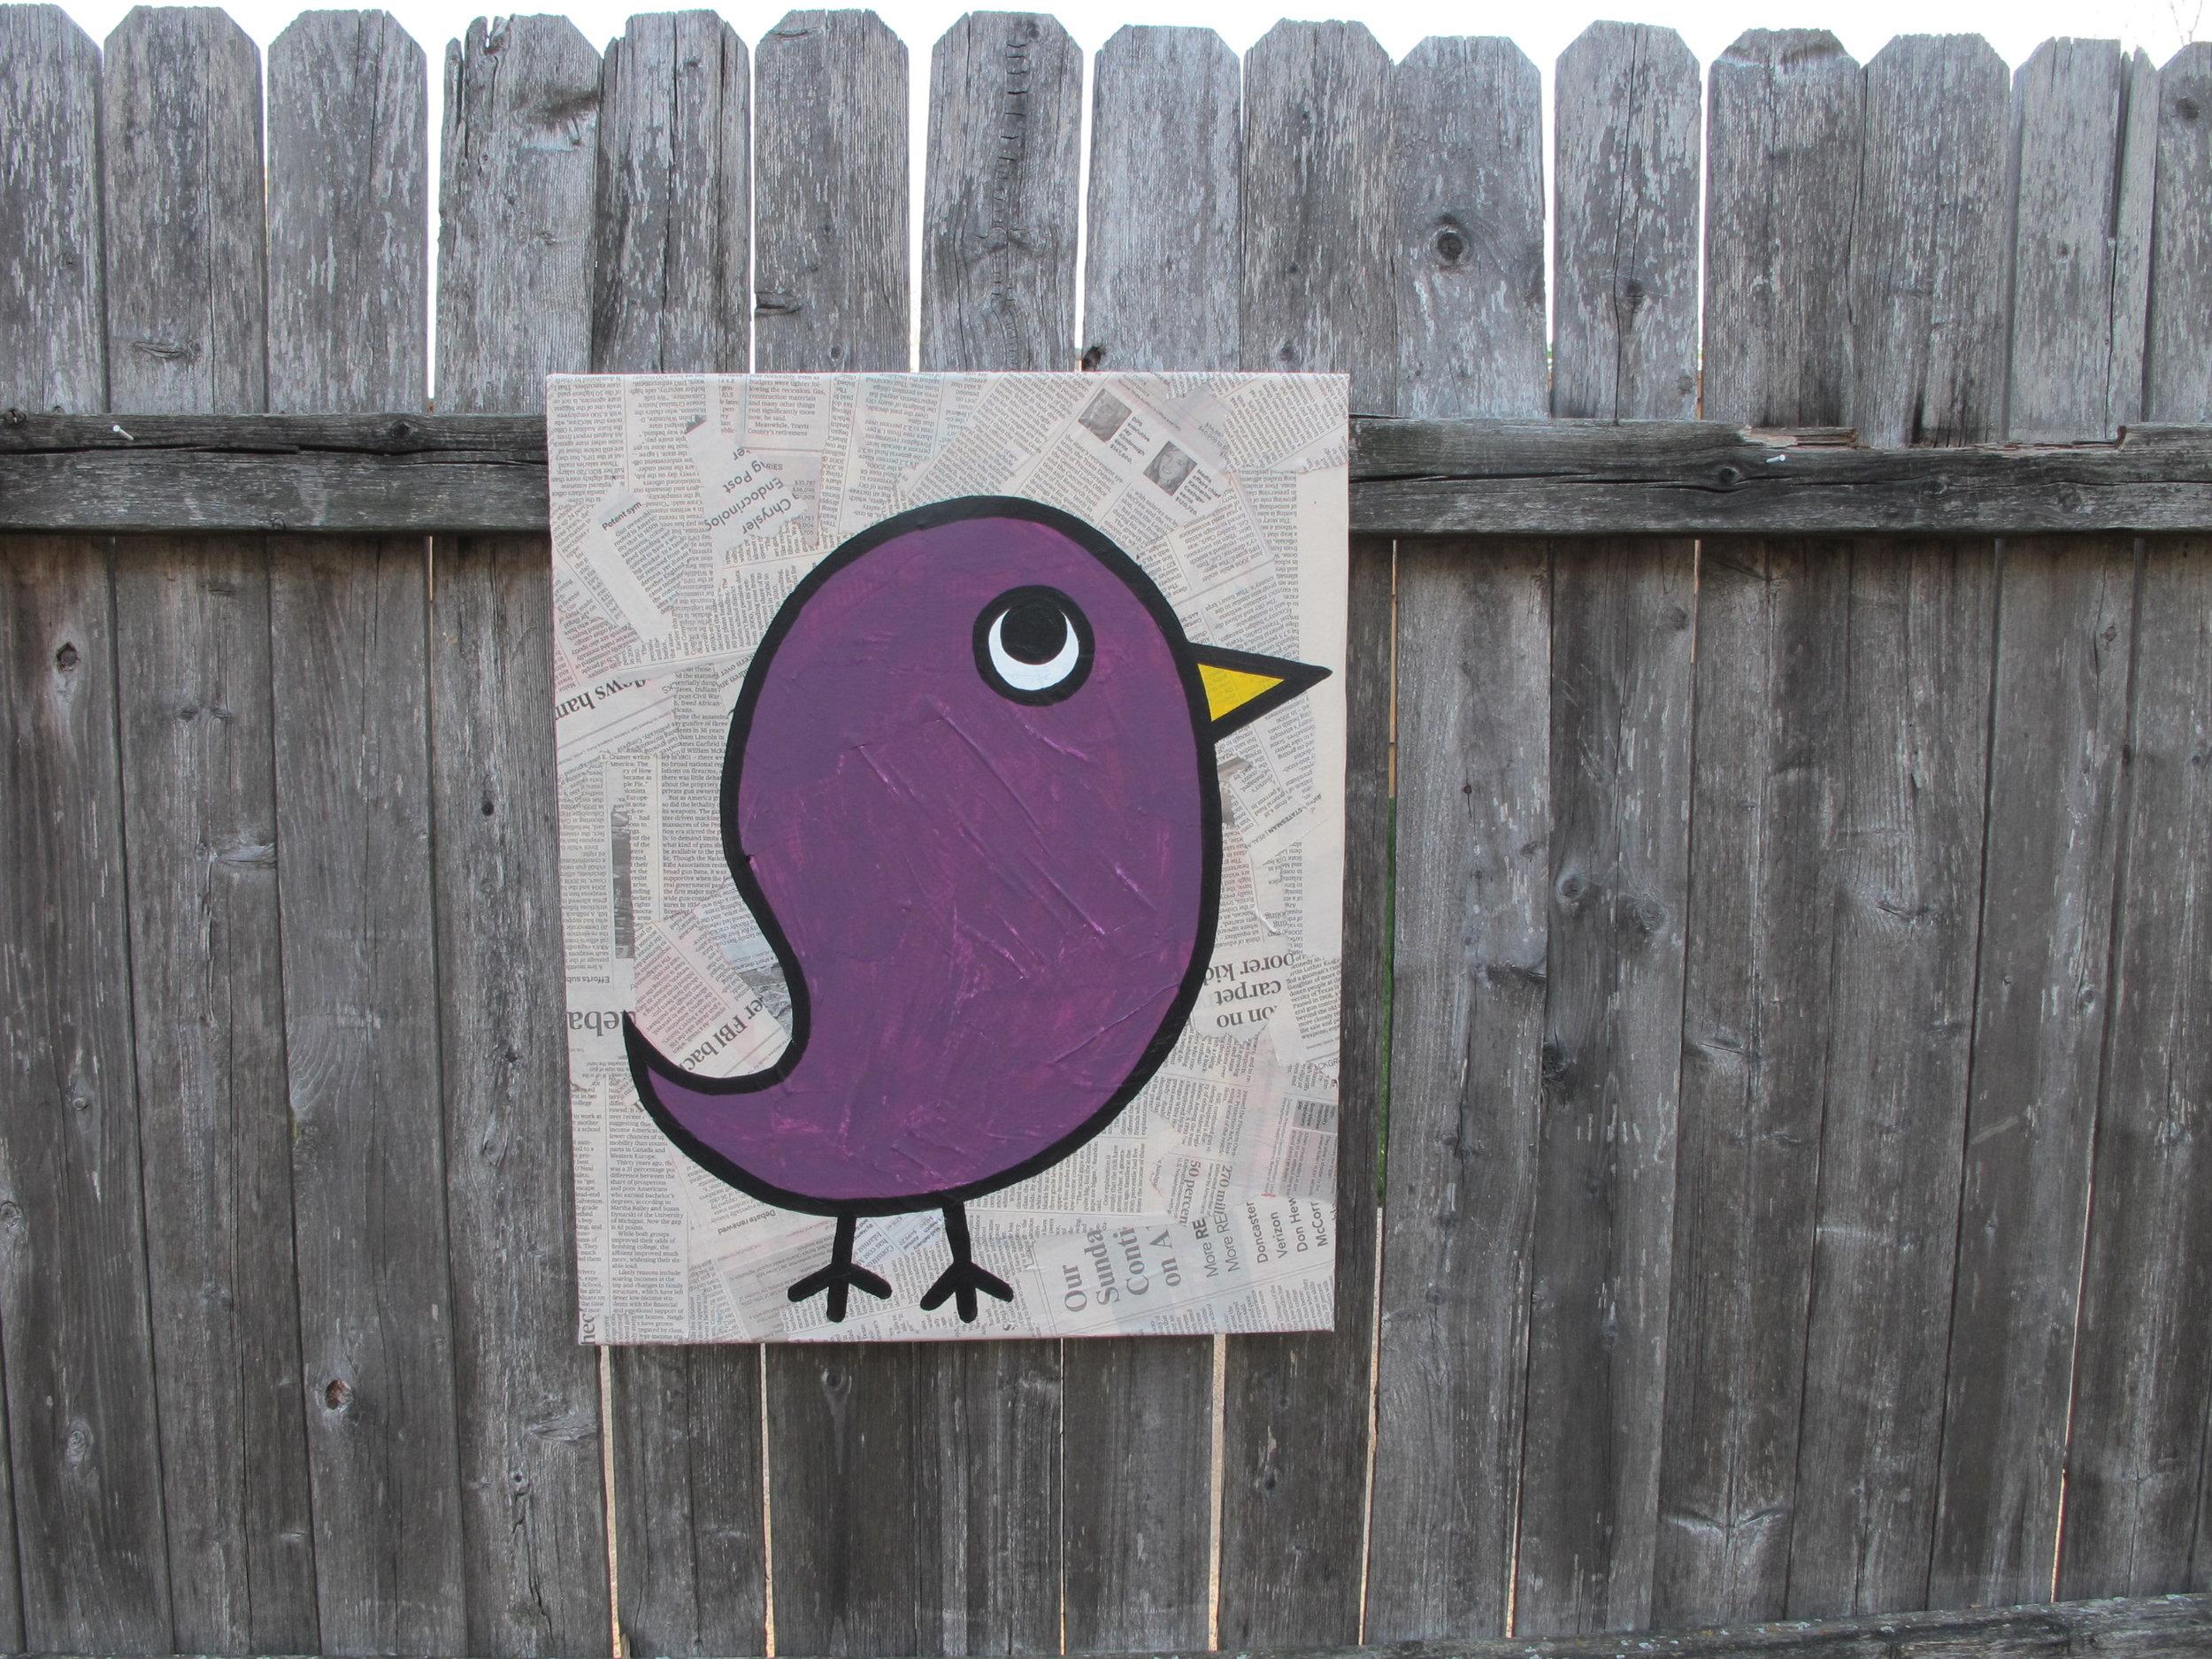 16x20 Bird on Newspaper - $50